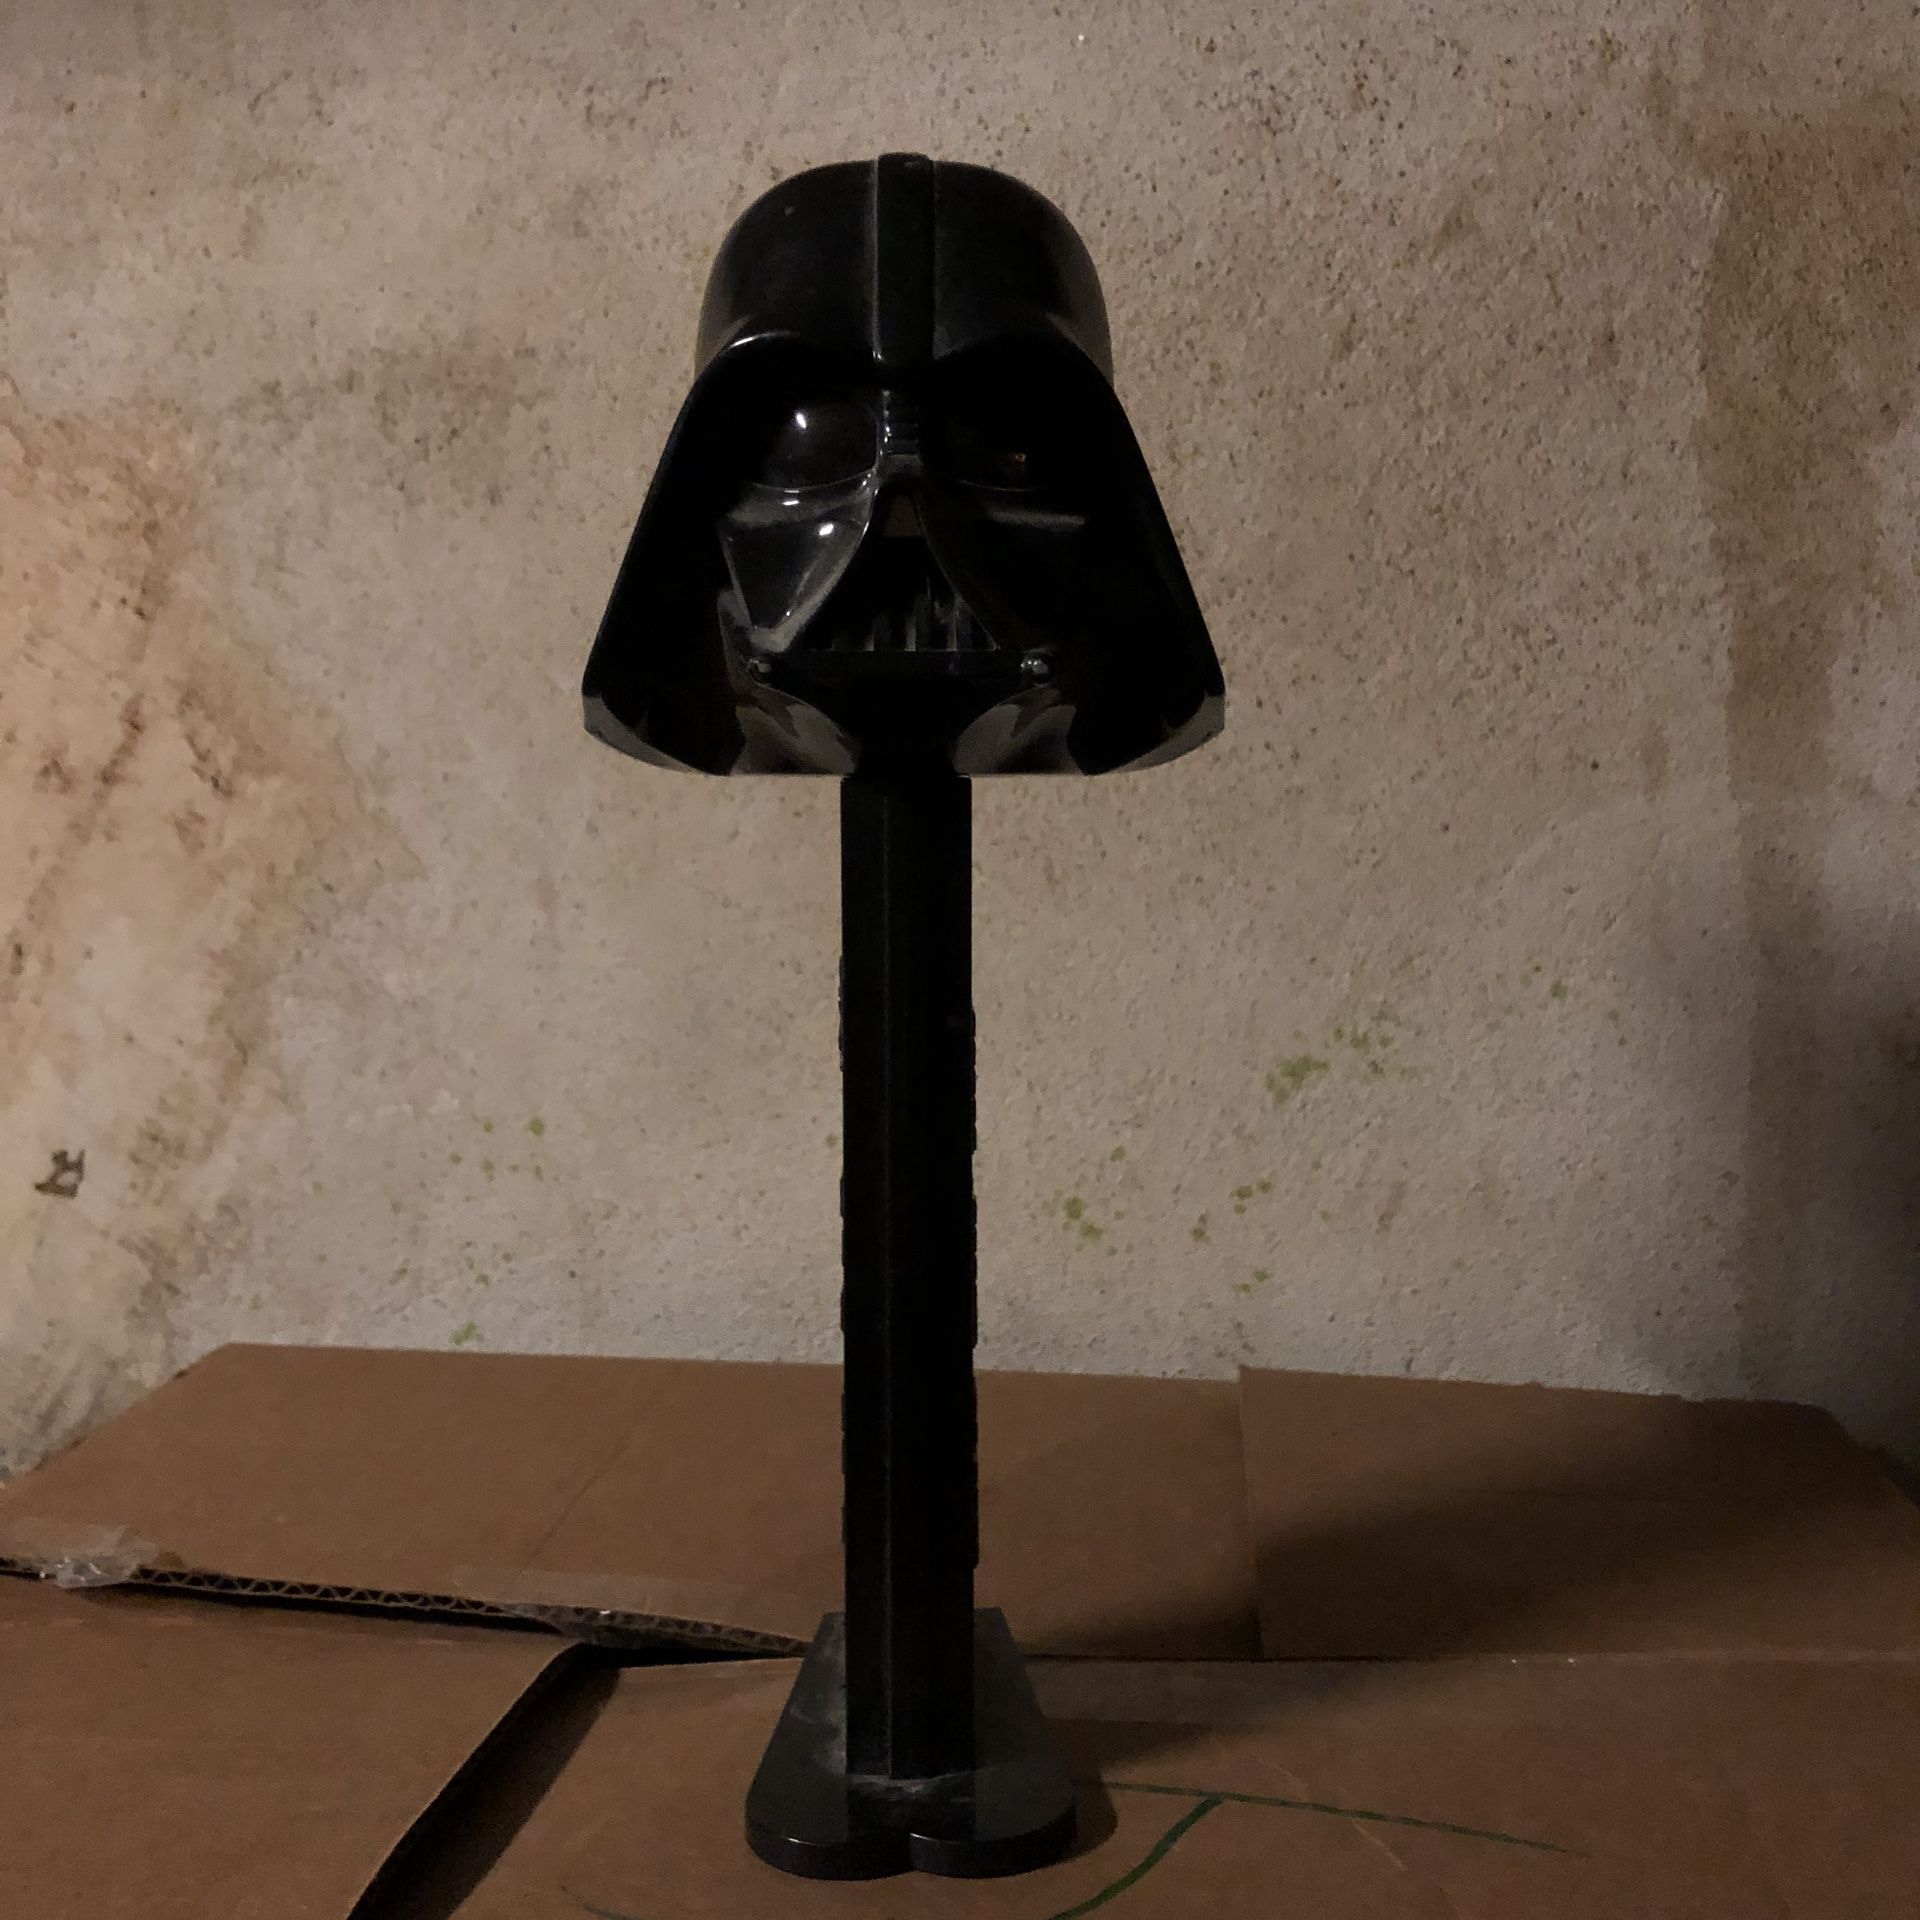 PEZ Darth Vader